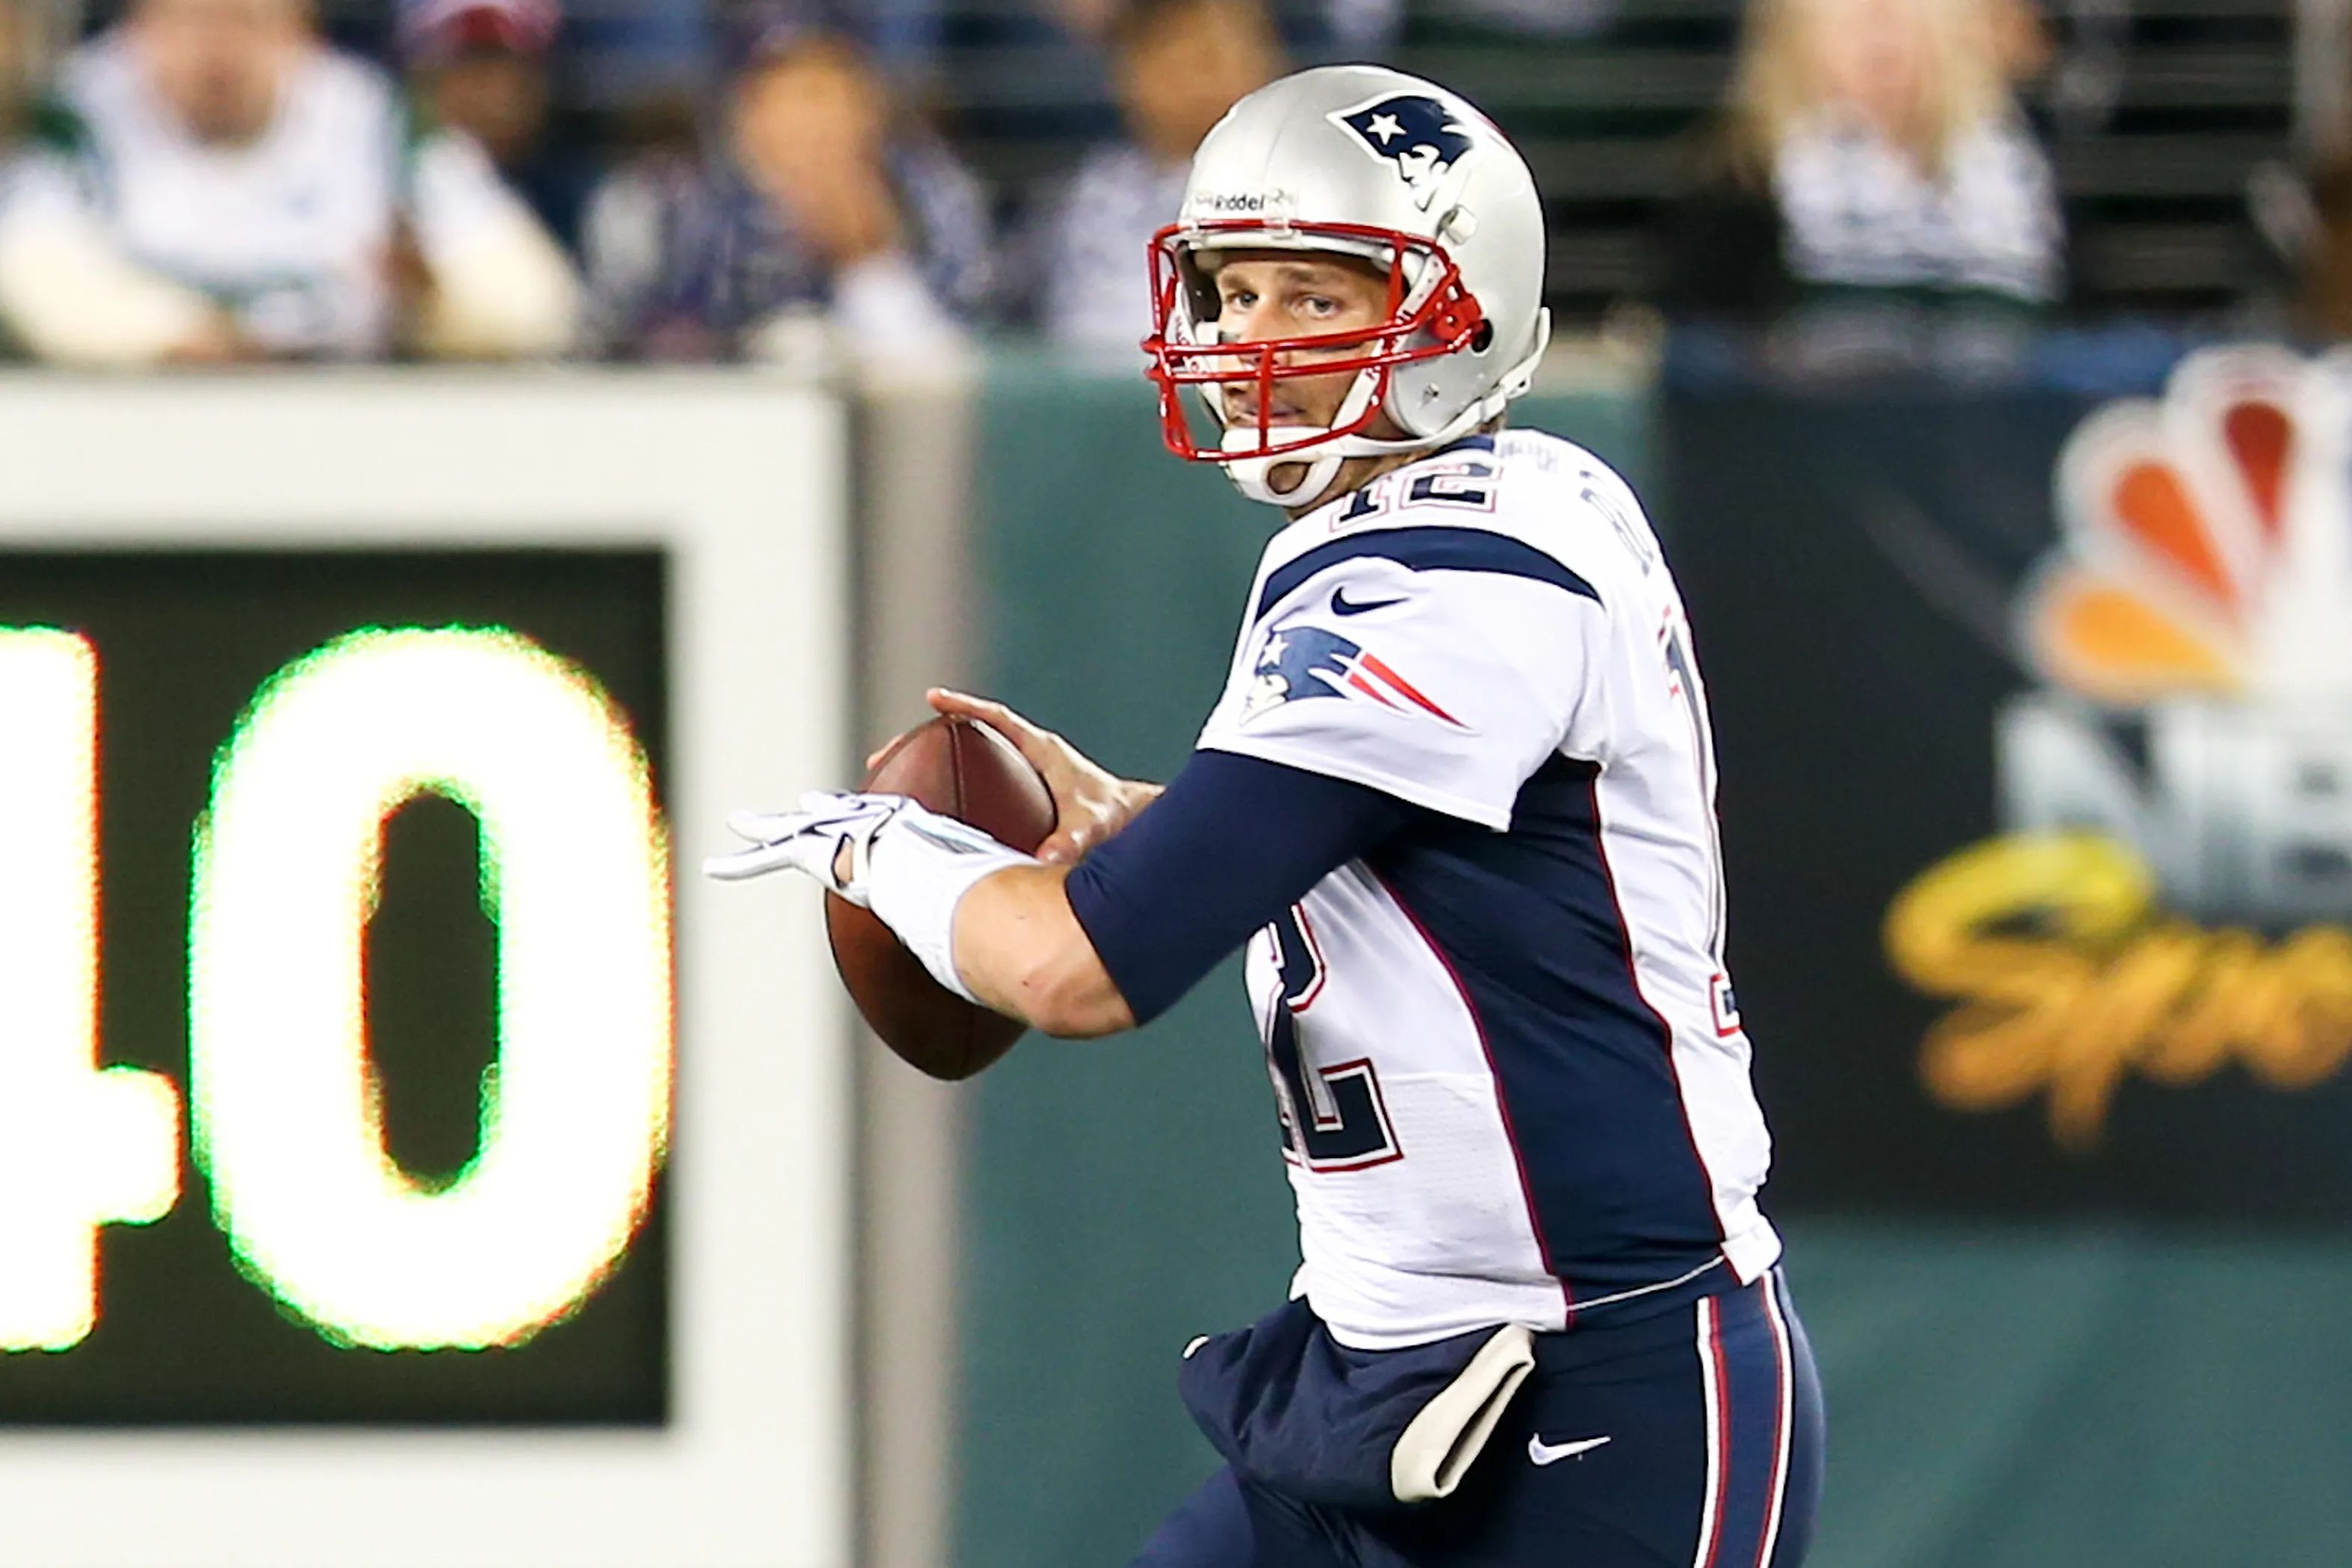 Tom Brady passing the ball